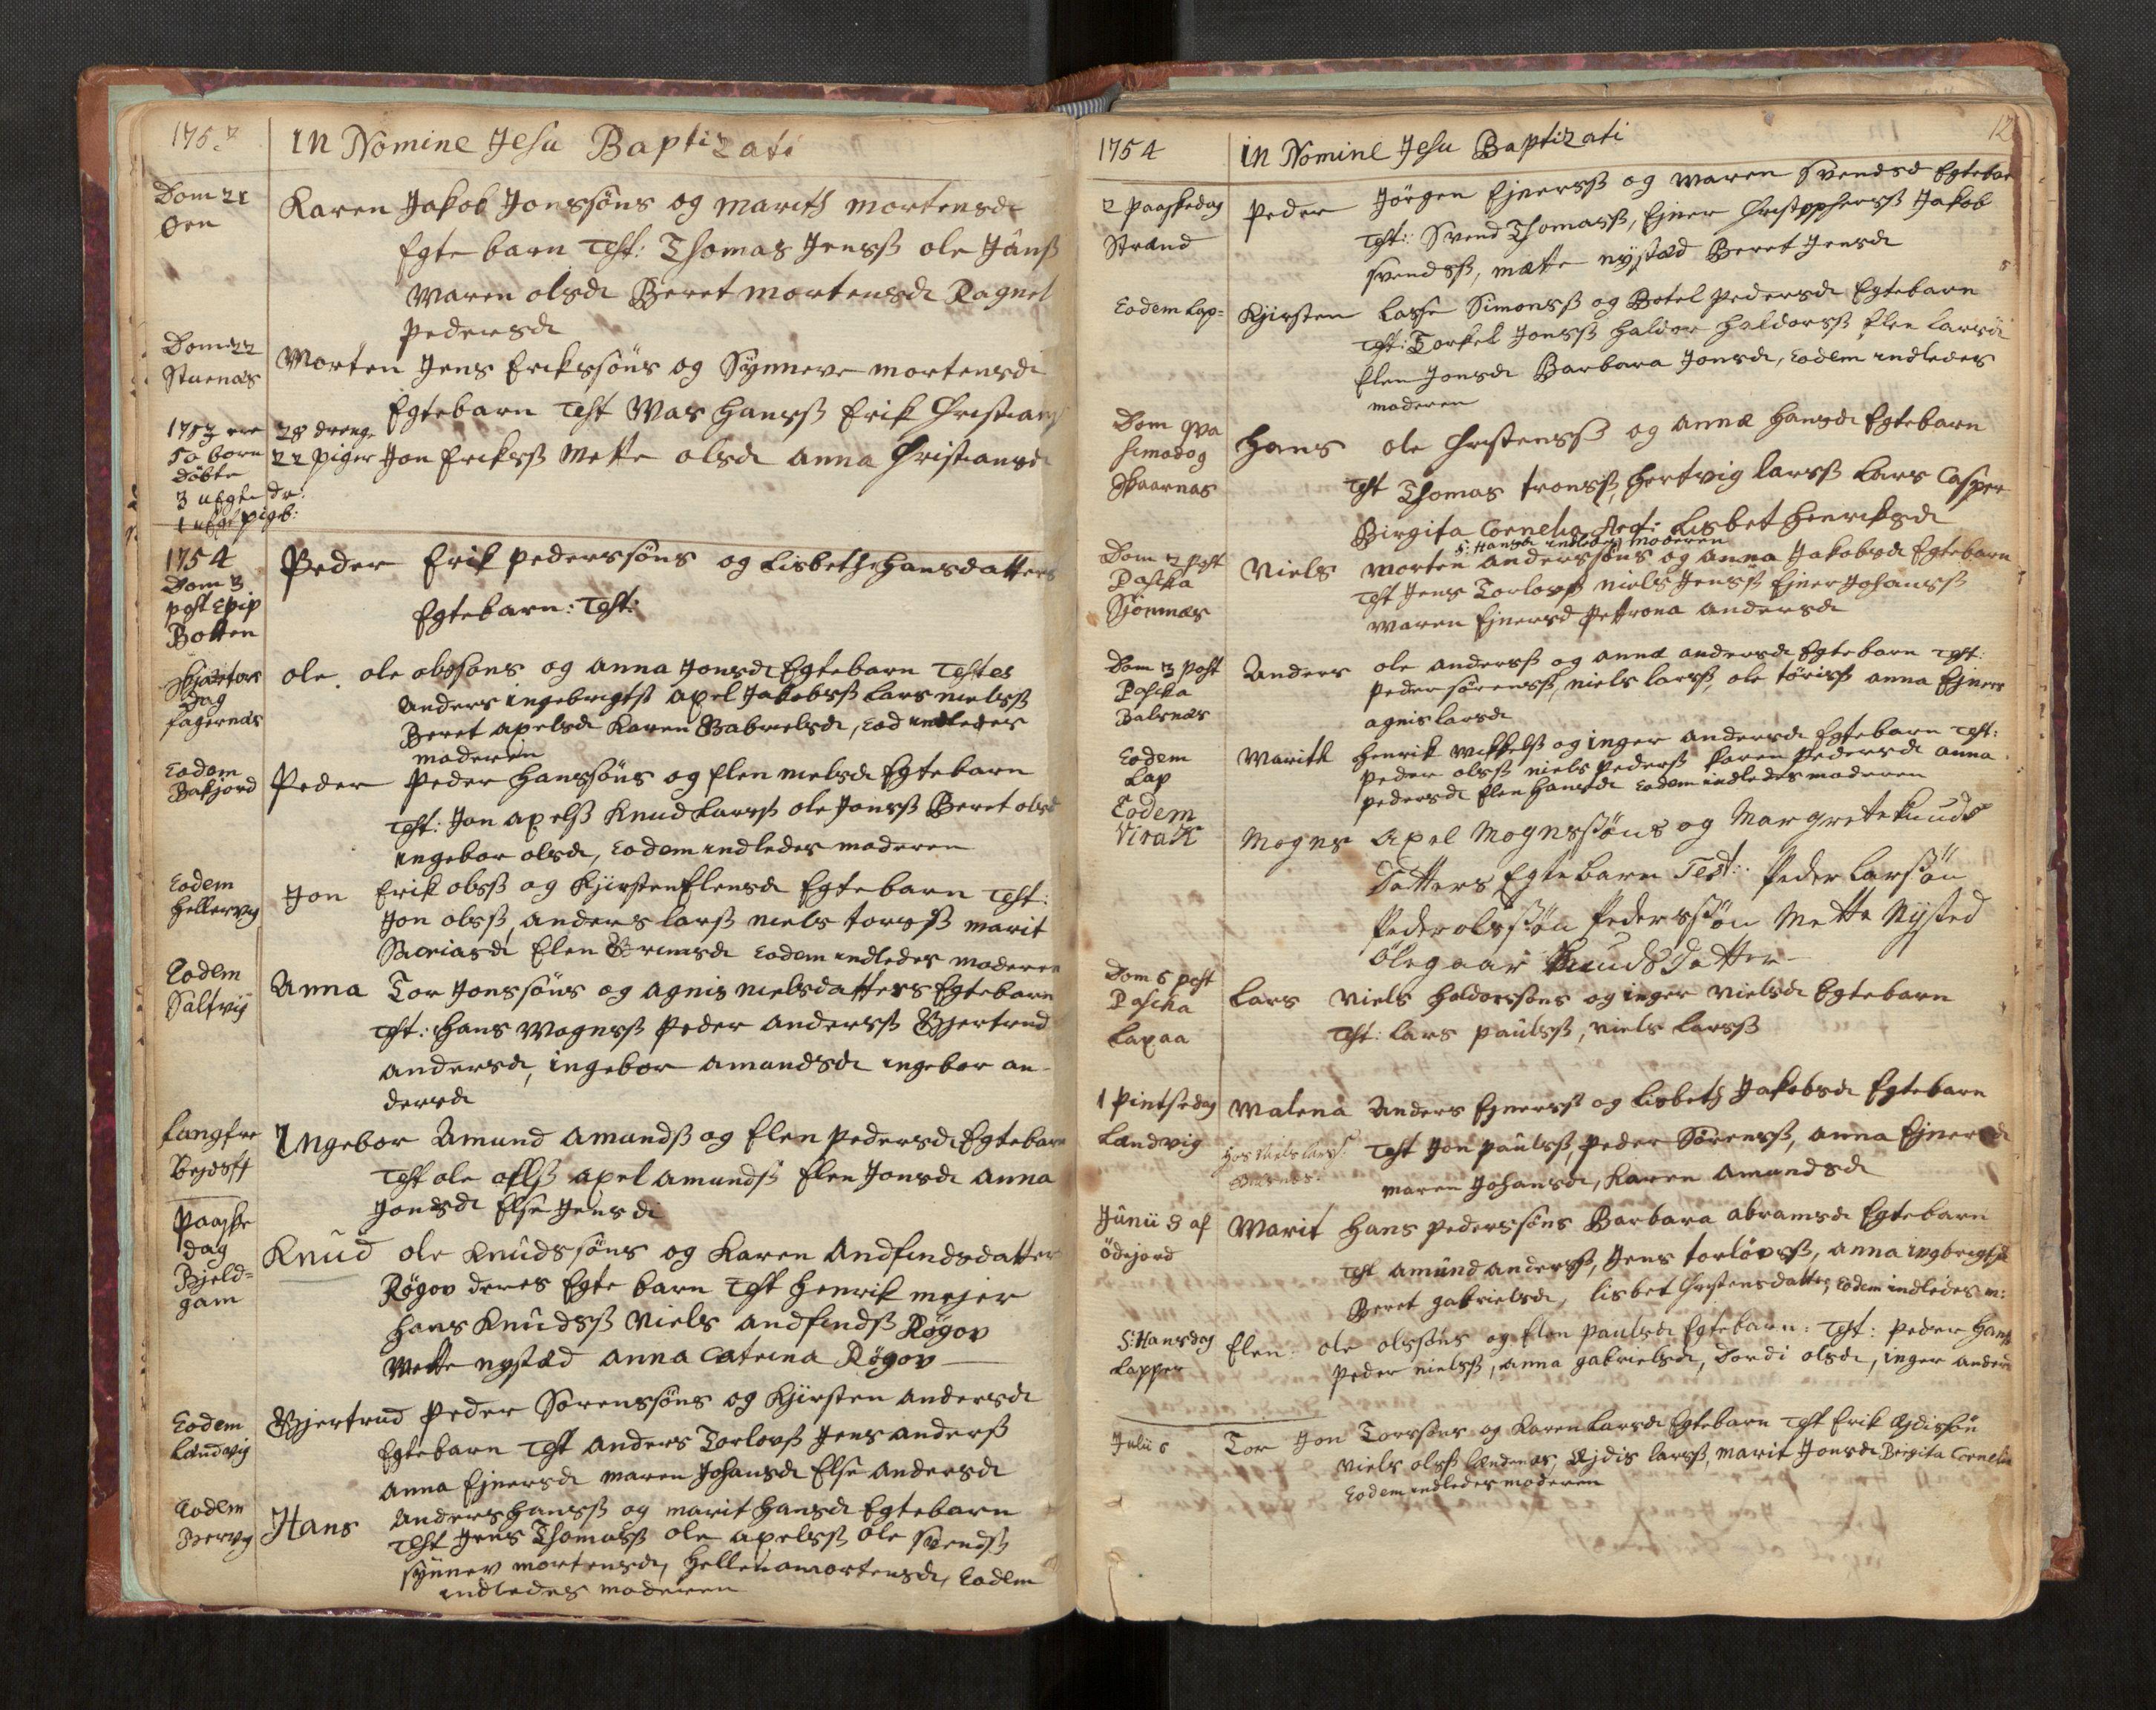 SAT, Ministerialprotokoller, klokkerbøker og fødselsregistre - Nordland, 863/L0891: Ministerialbok nr. 863A03, 1748-1764, s. 12